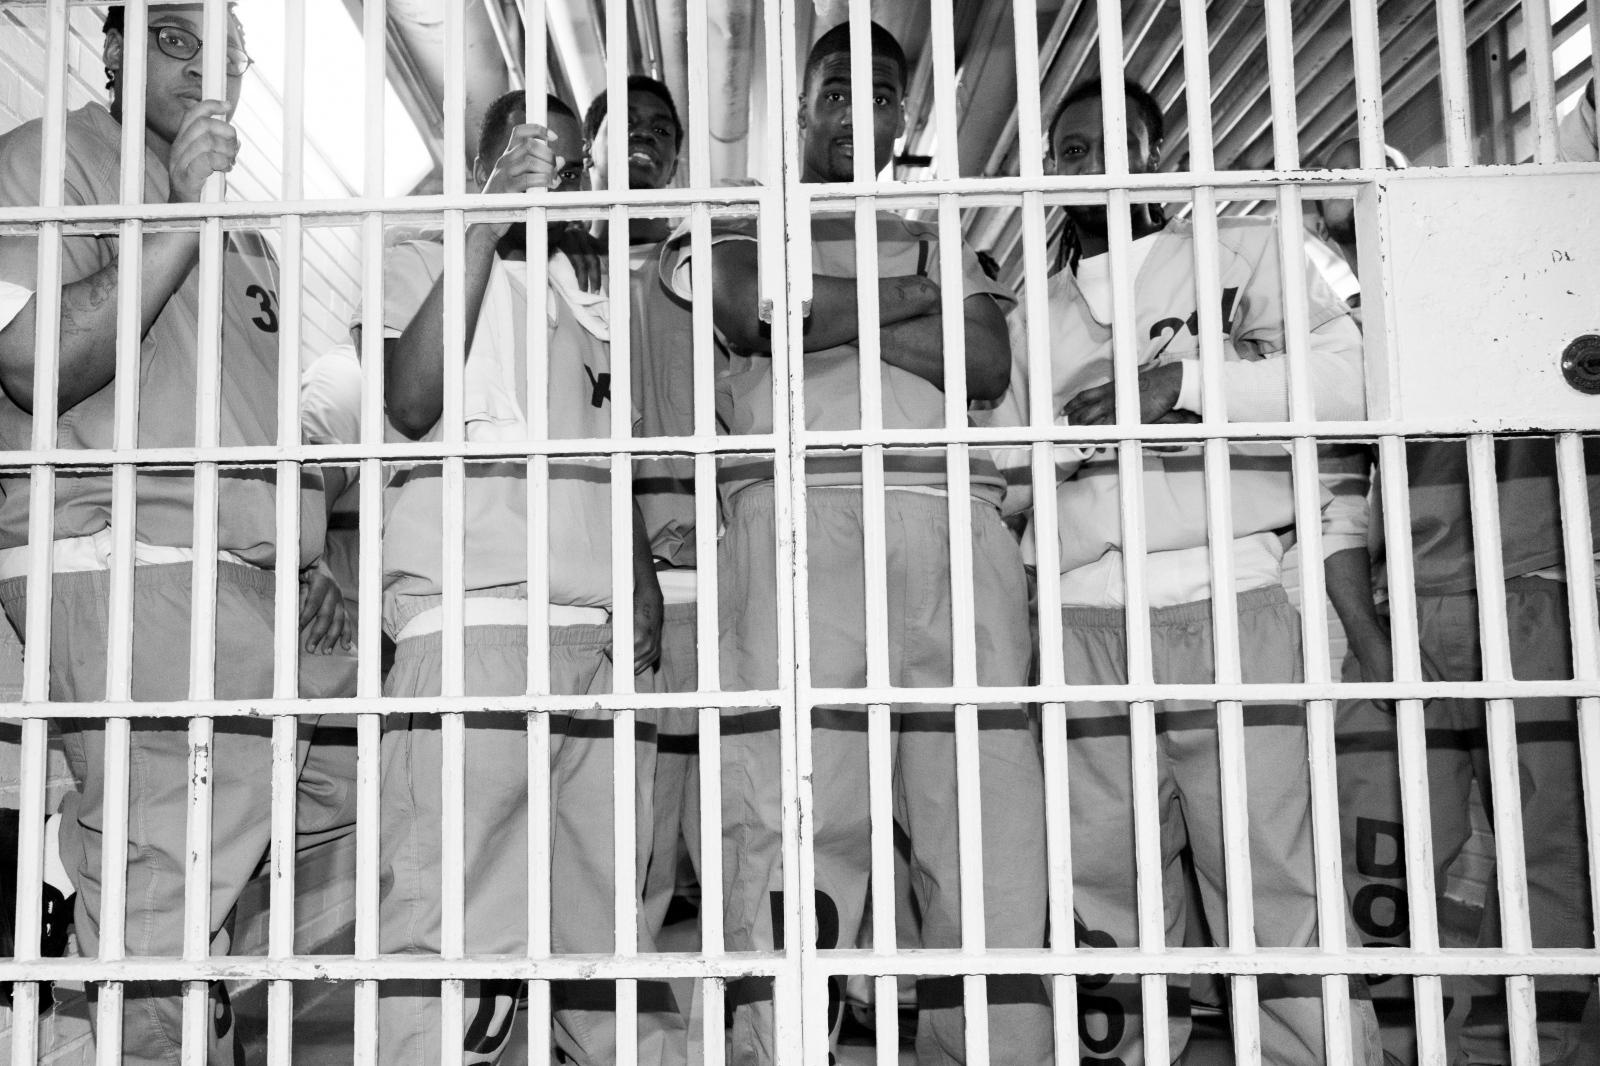 Art and Documentary Photography - Loading LiliHolzerGlier_Inmates.jpg